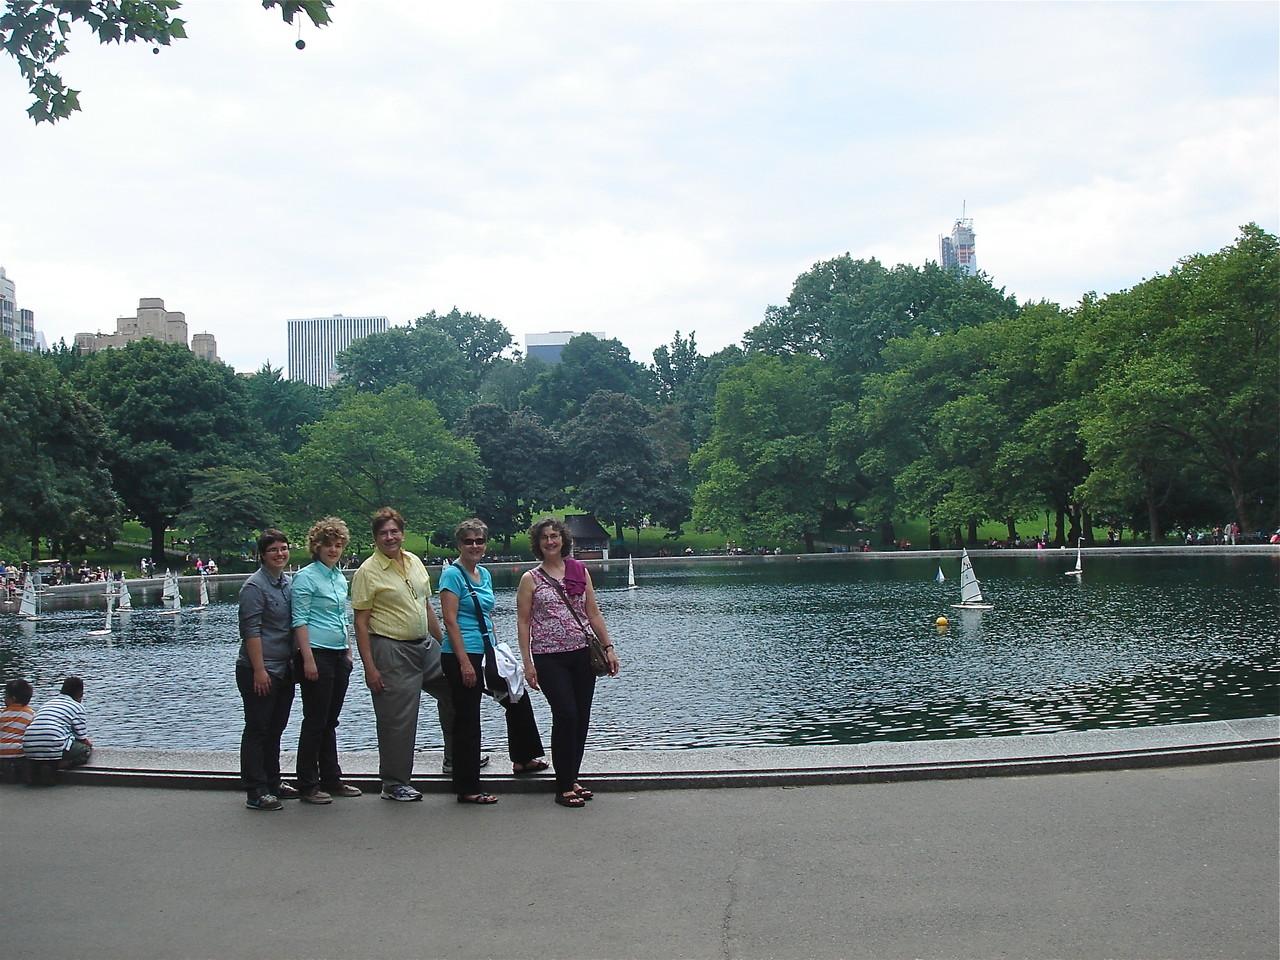 Emilea, Kathleen, John, Cindy, & Ann Ackerman Central Park, 6-16-2013